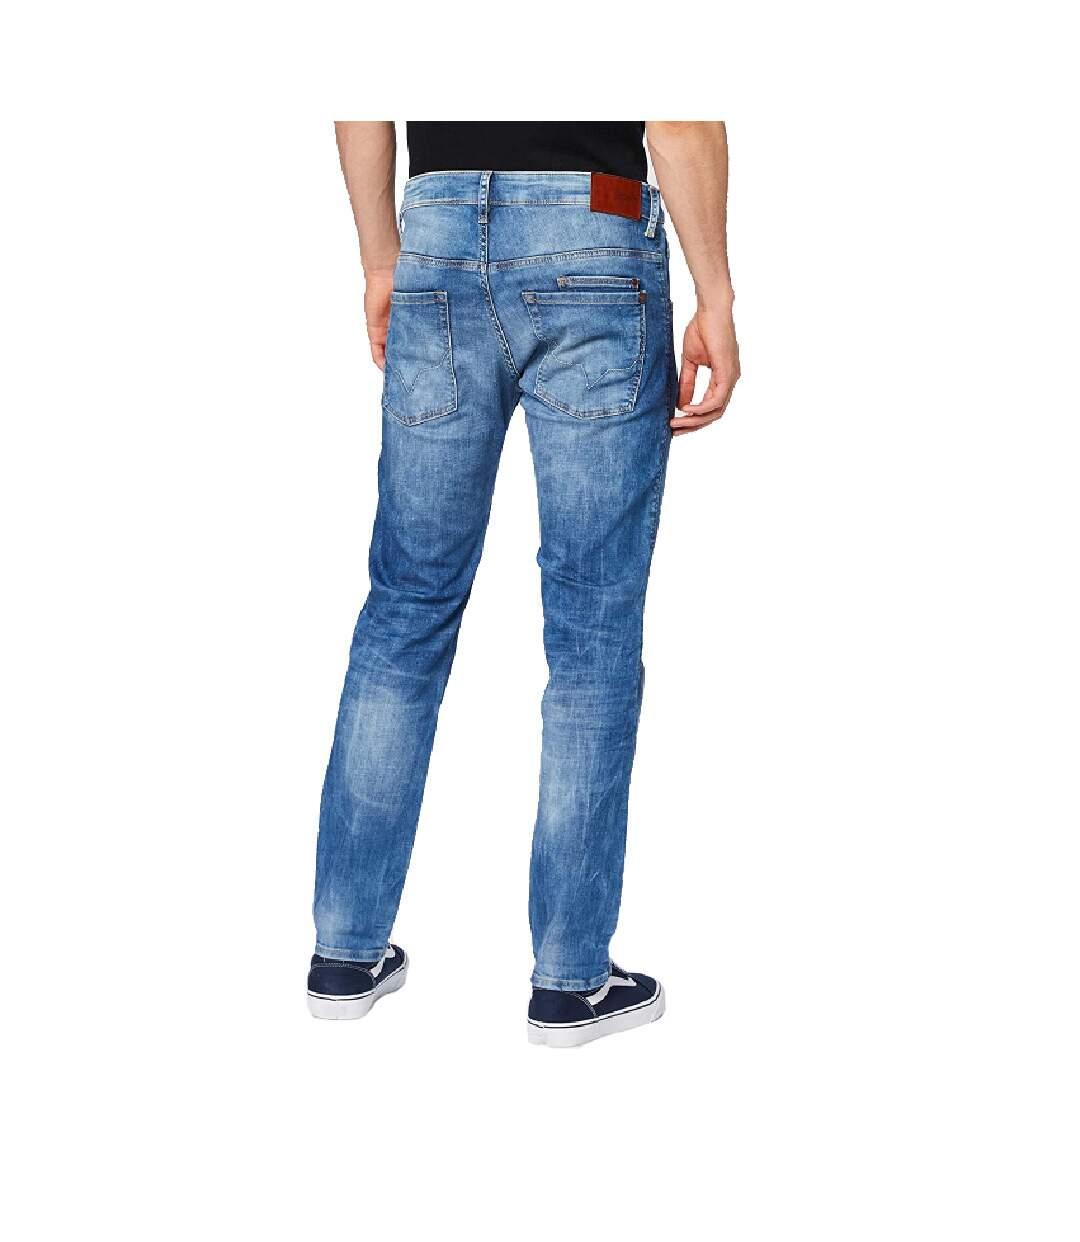 Jeans Regular Bleu Homme Pepe Jeans Spike